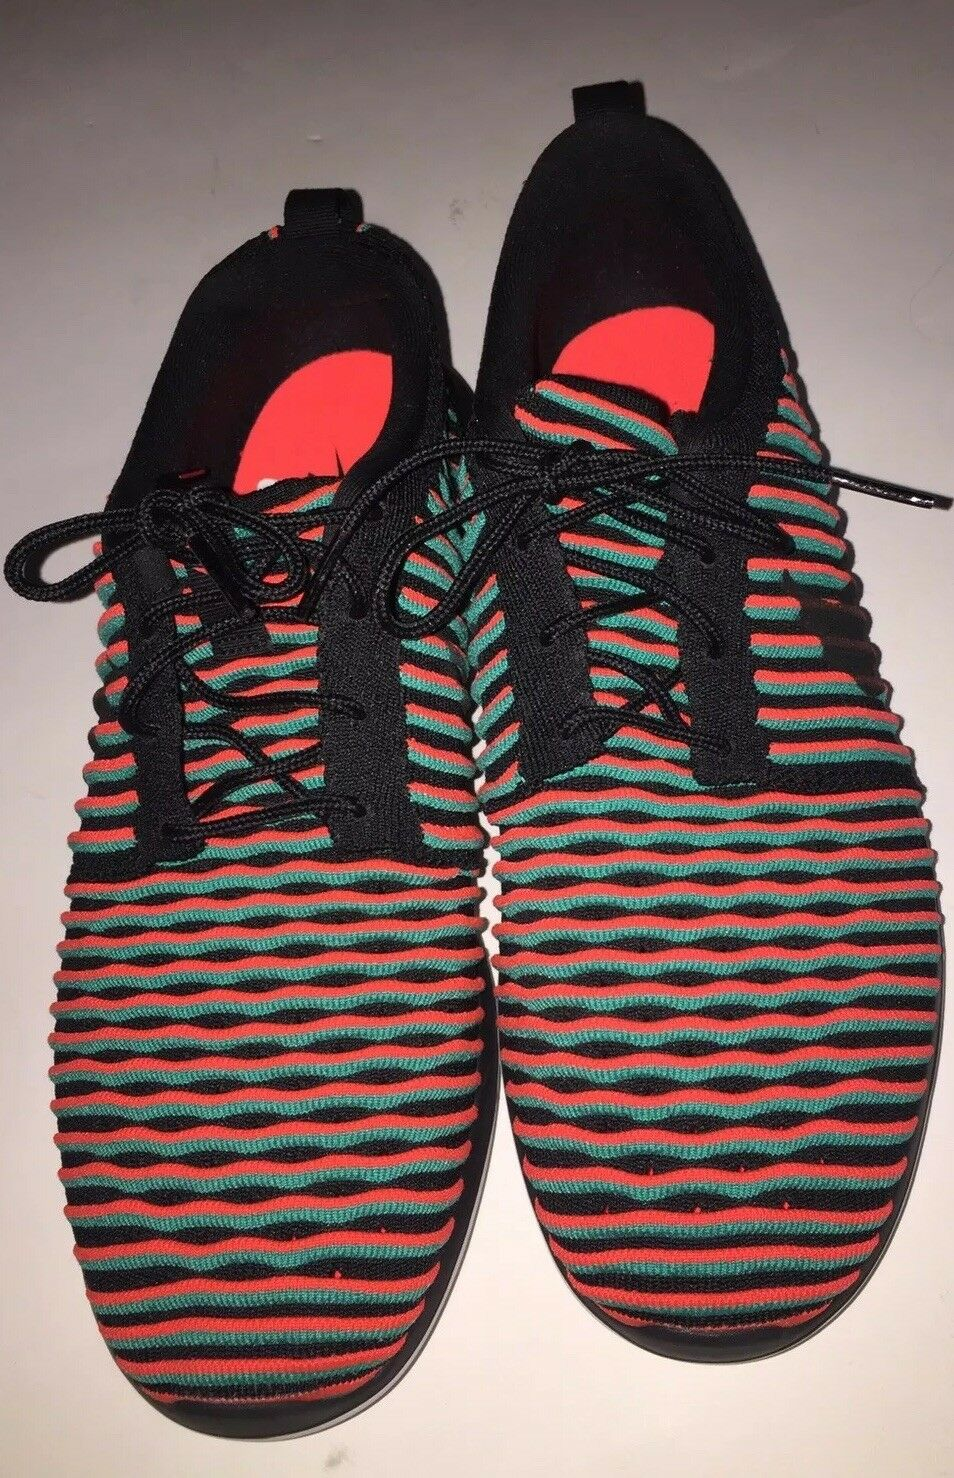 Nike Roshe Two Flyknit orange Mens Running Workout Sneakers 844833 003 Size 10